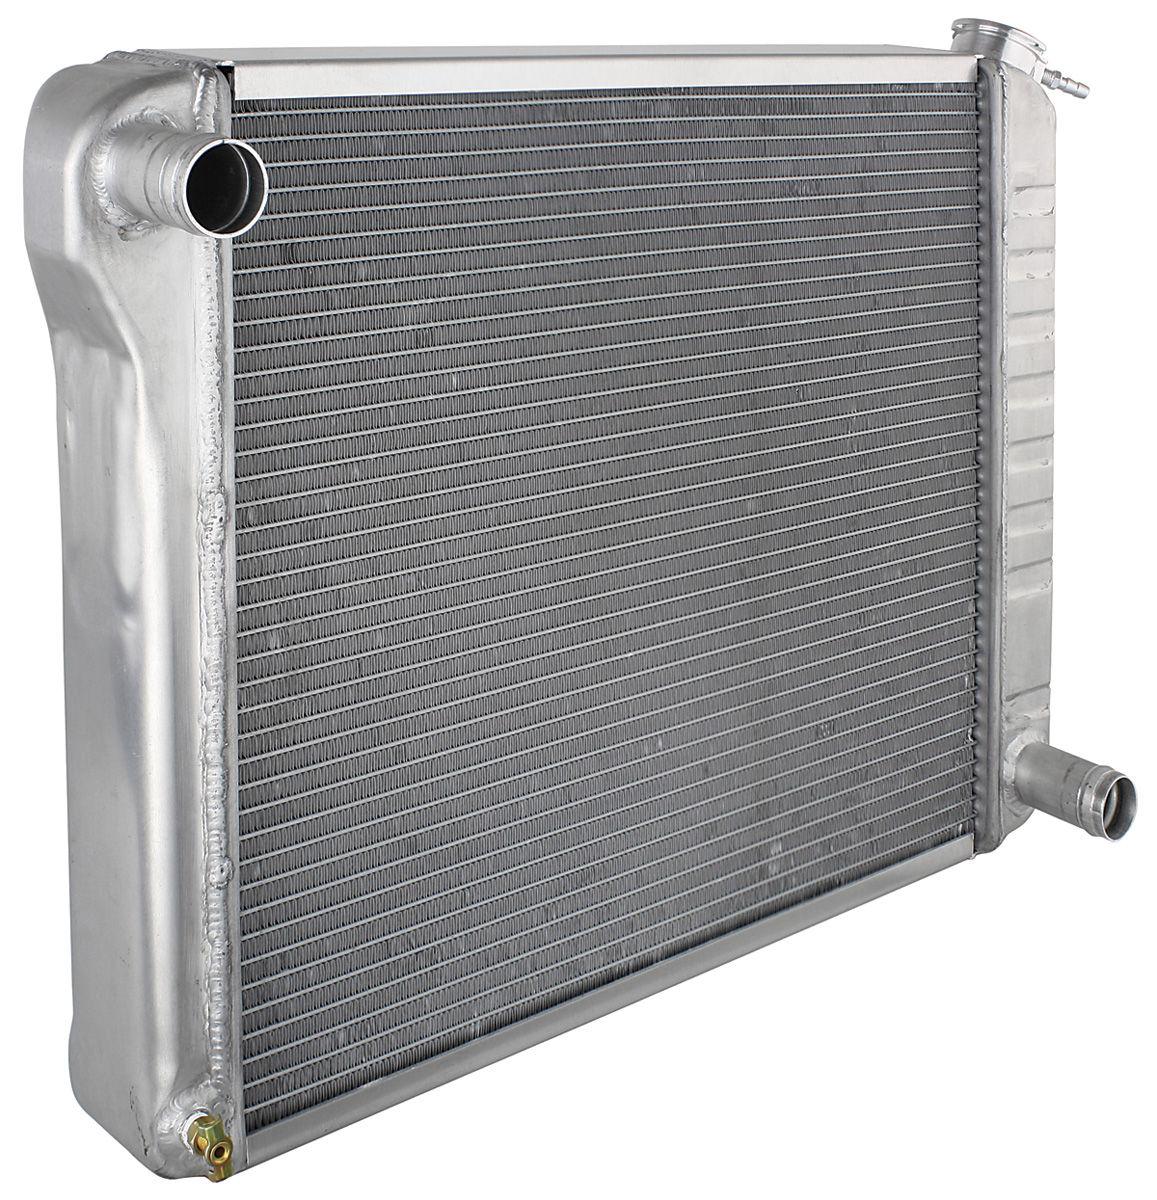 Radiator, 1968-72 Chevrolet, BOP, Aluminum, AT, Satin